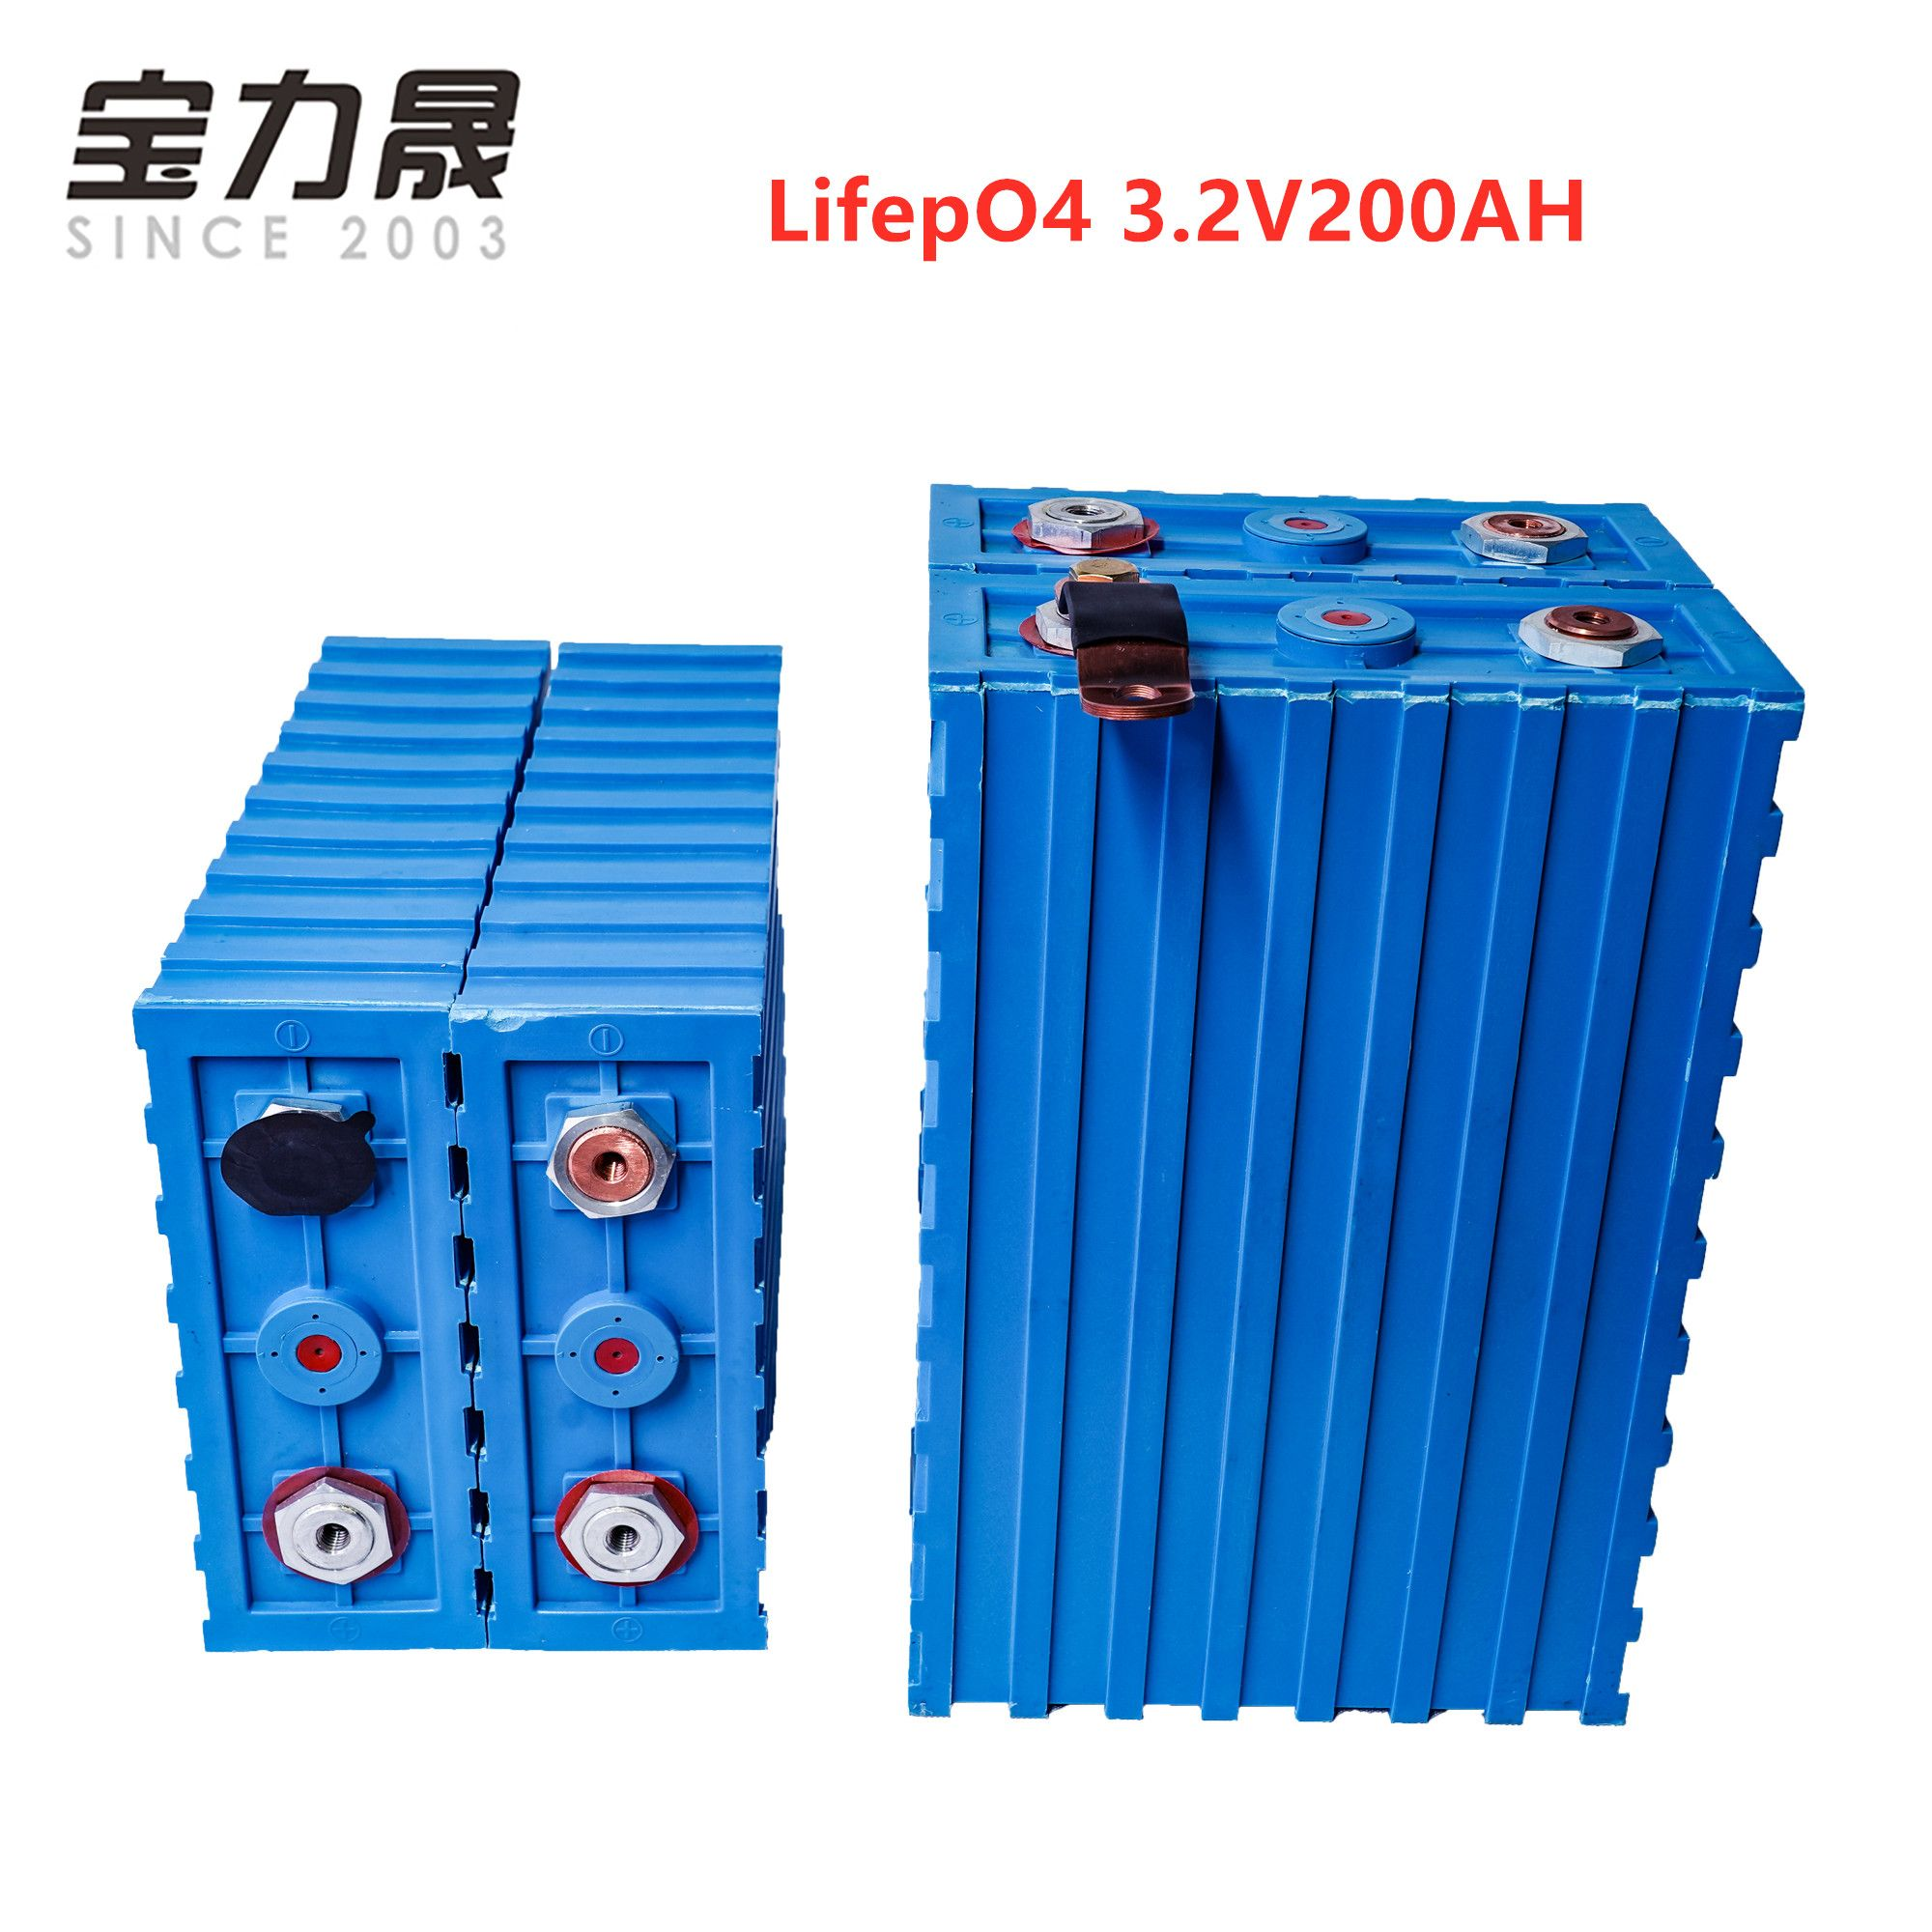 LiFePO4 Akkus 3.2V200ah zelle NEUE CALB SE200FI Kunststoff 12v200AH 24V für pack EV solar batterie UNS EU AU steuer-freies